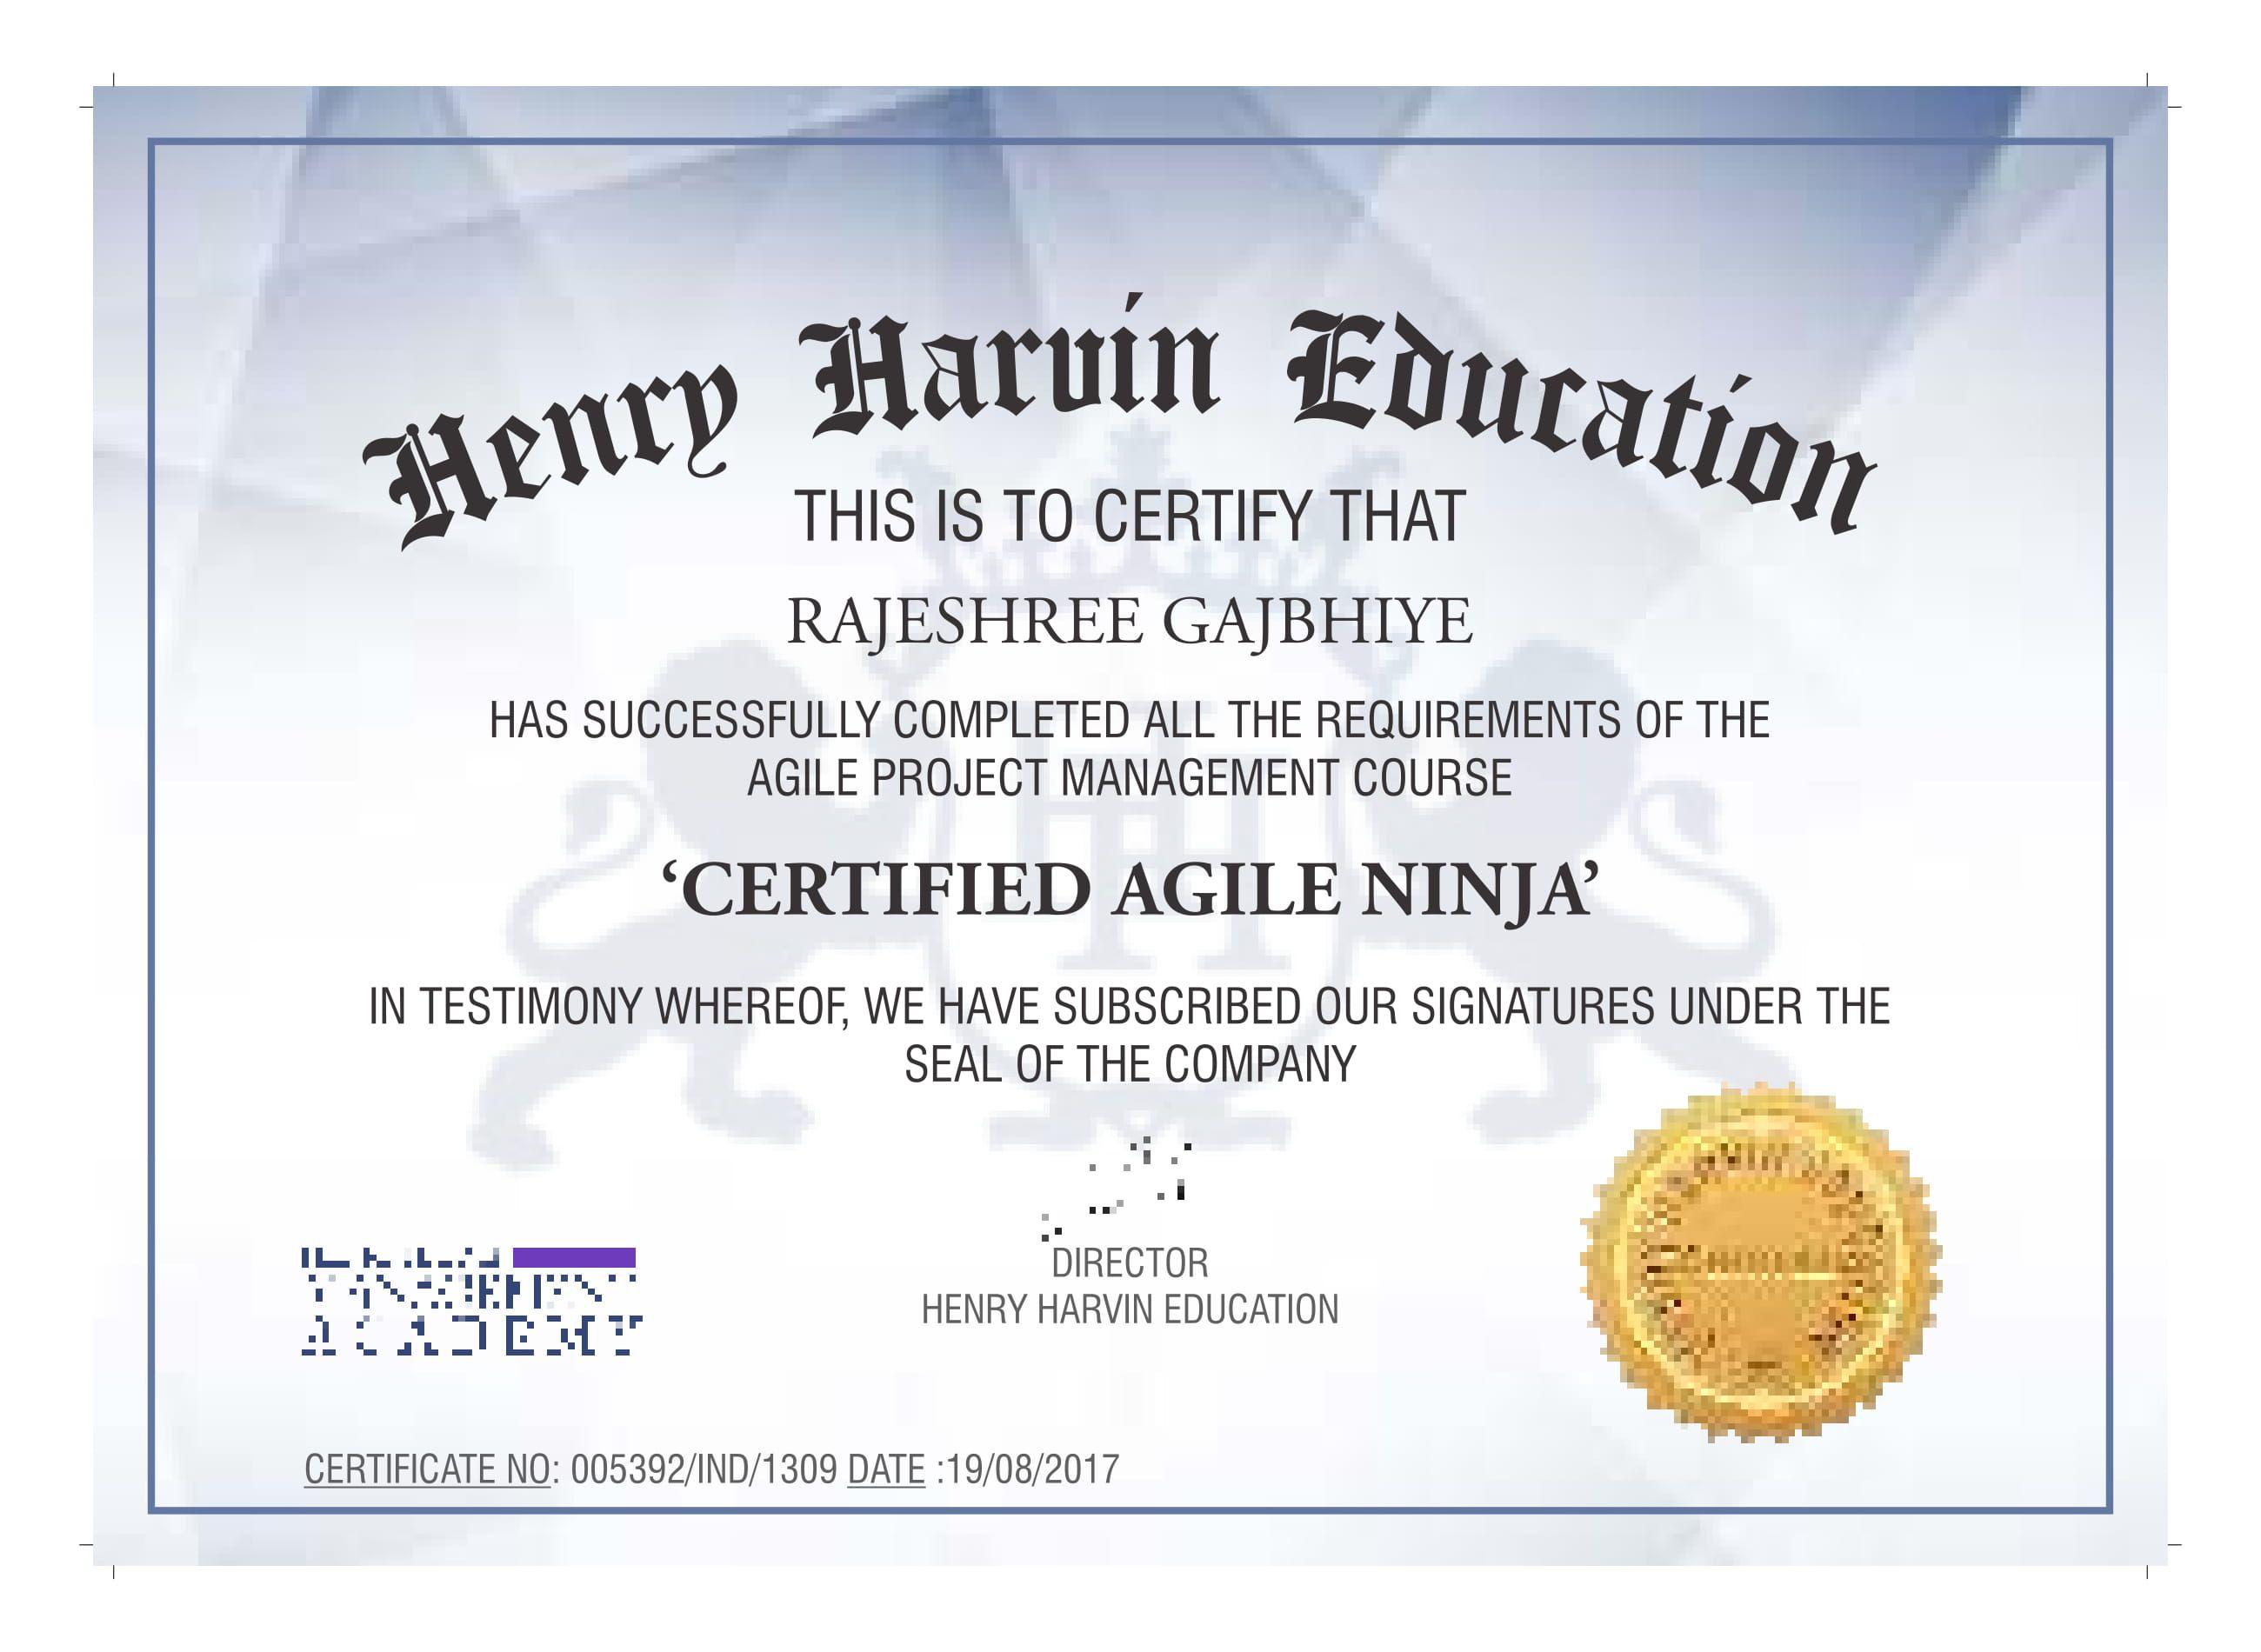 agile management harvin henry training certification program education henryharvin eligible become